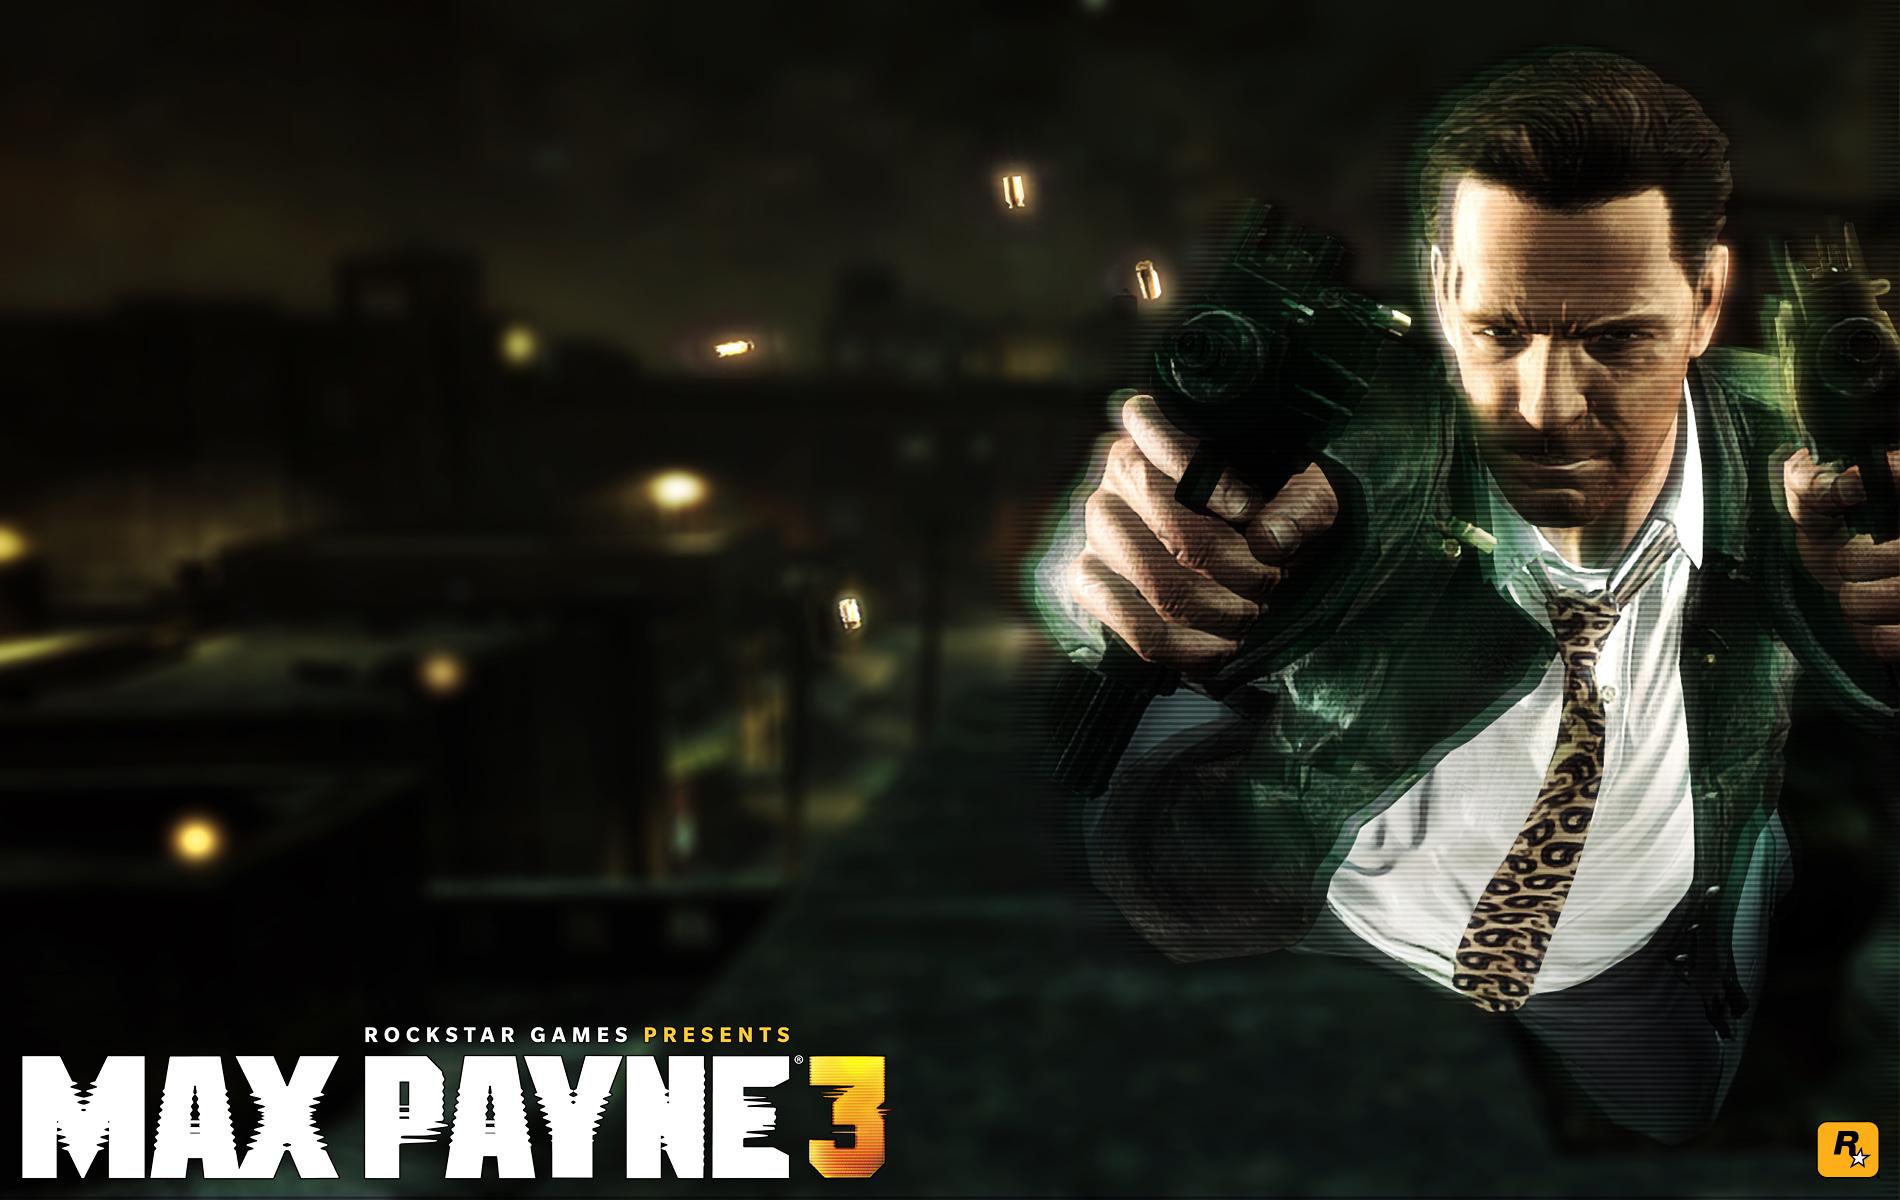 Max Payne 3 HD Wallpapers 1900x1200